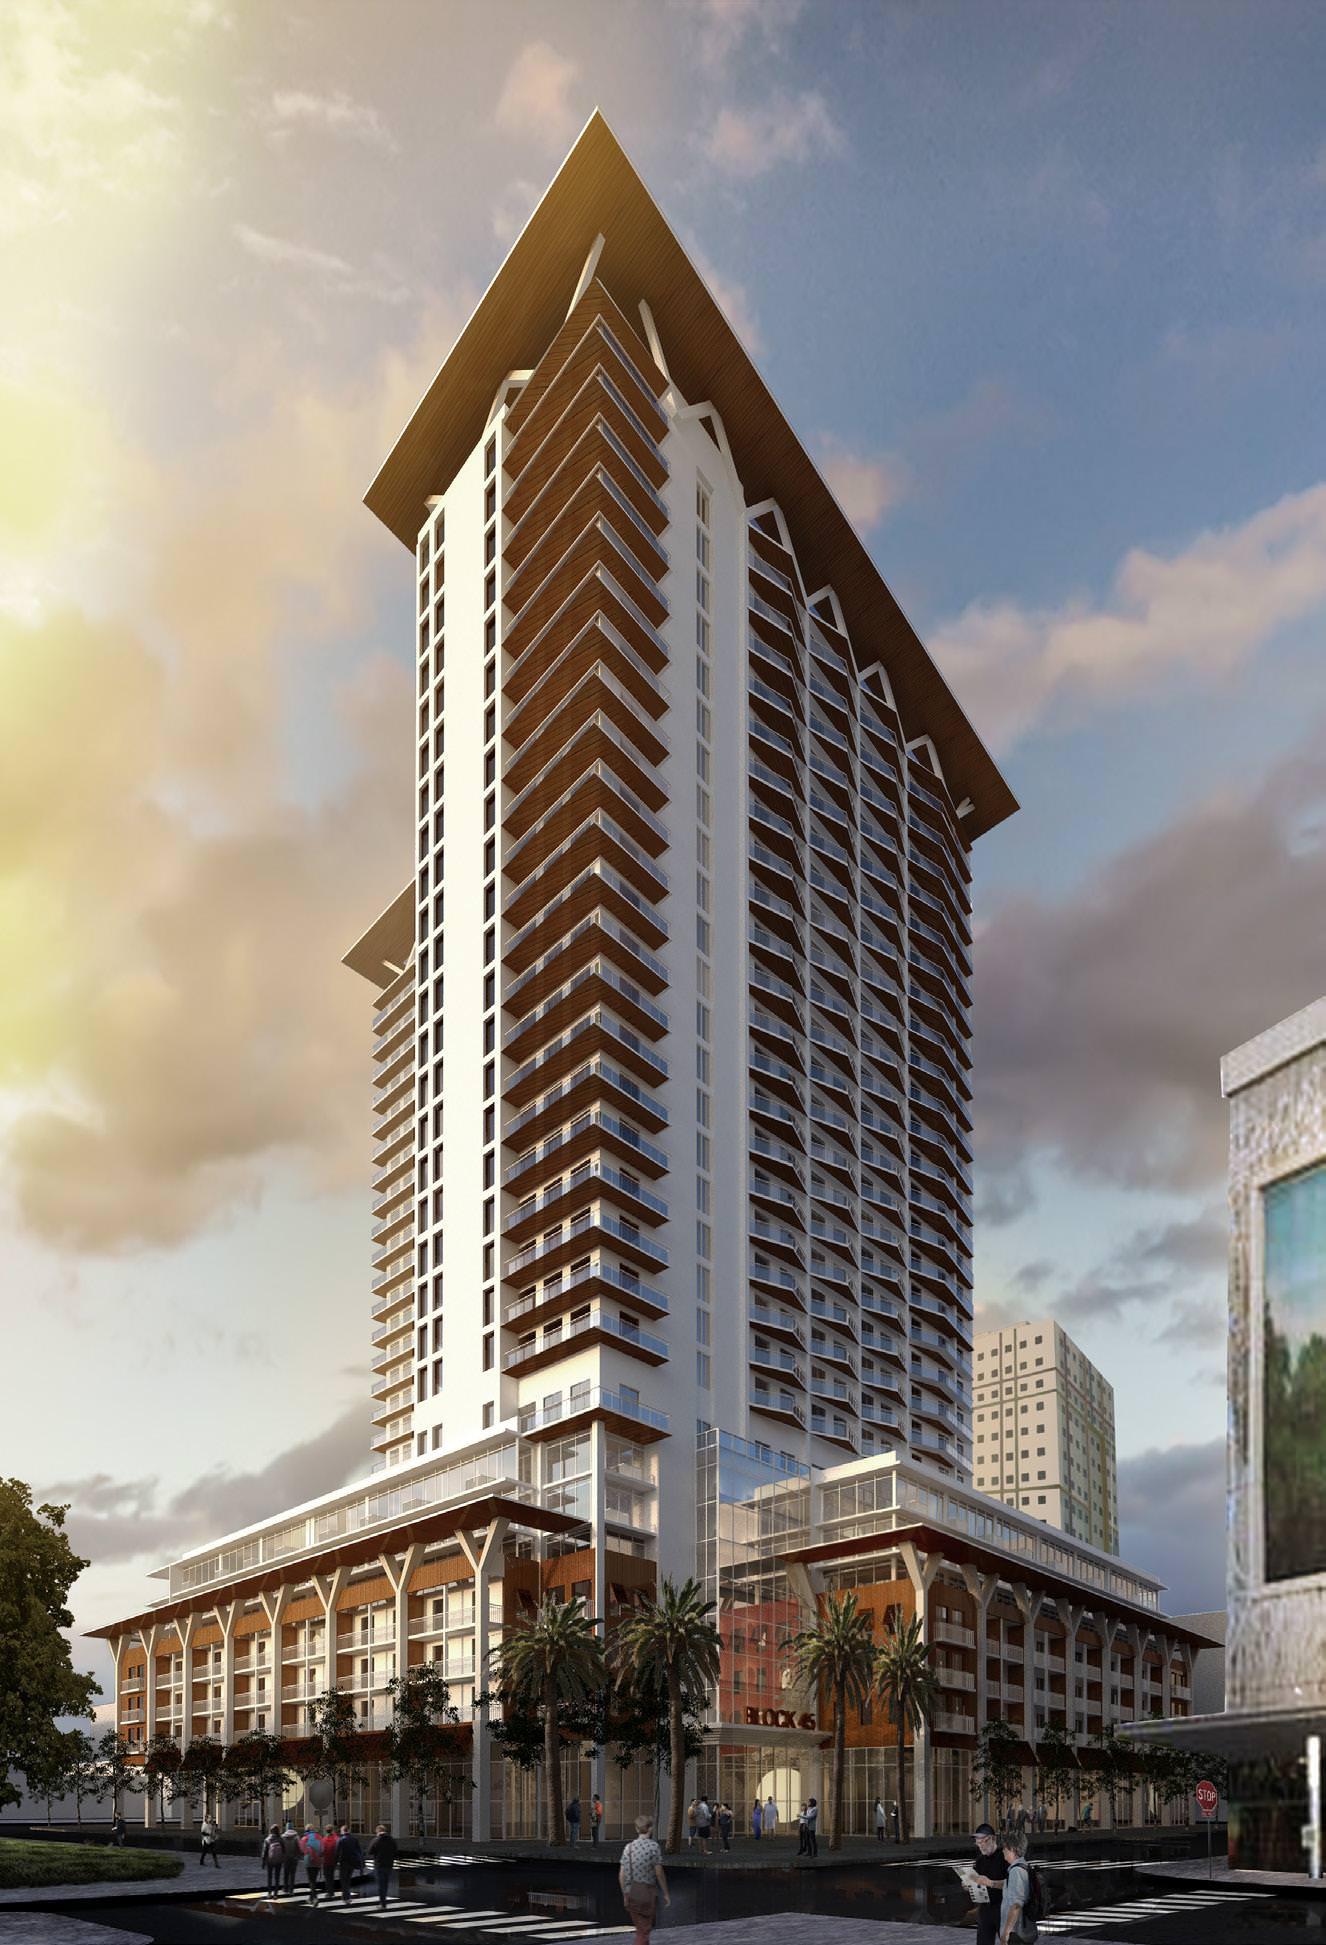 Atlantic Pacific Communities' Bermello, Ajamil & Partners-Designed Proposal Chosen For Downtown's Block 45